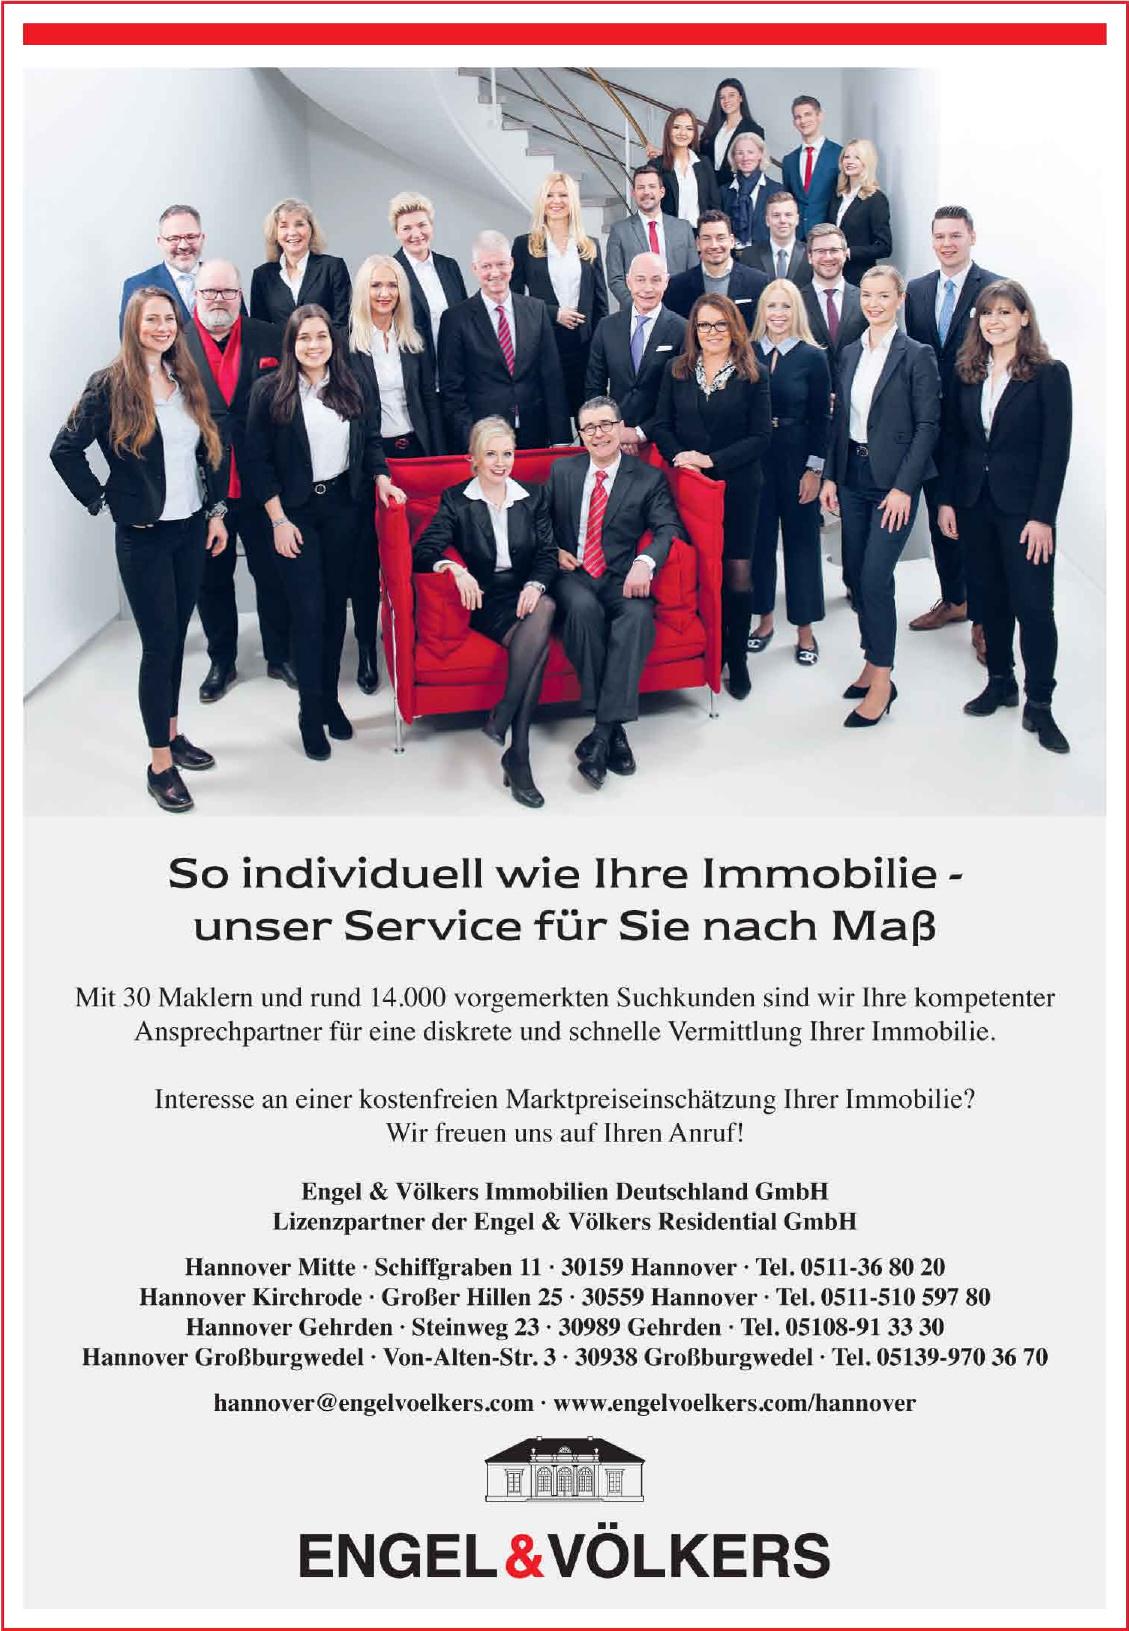 Engel & Völkers Immobilien Deutschland GmbH